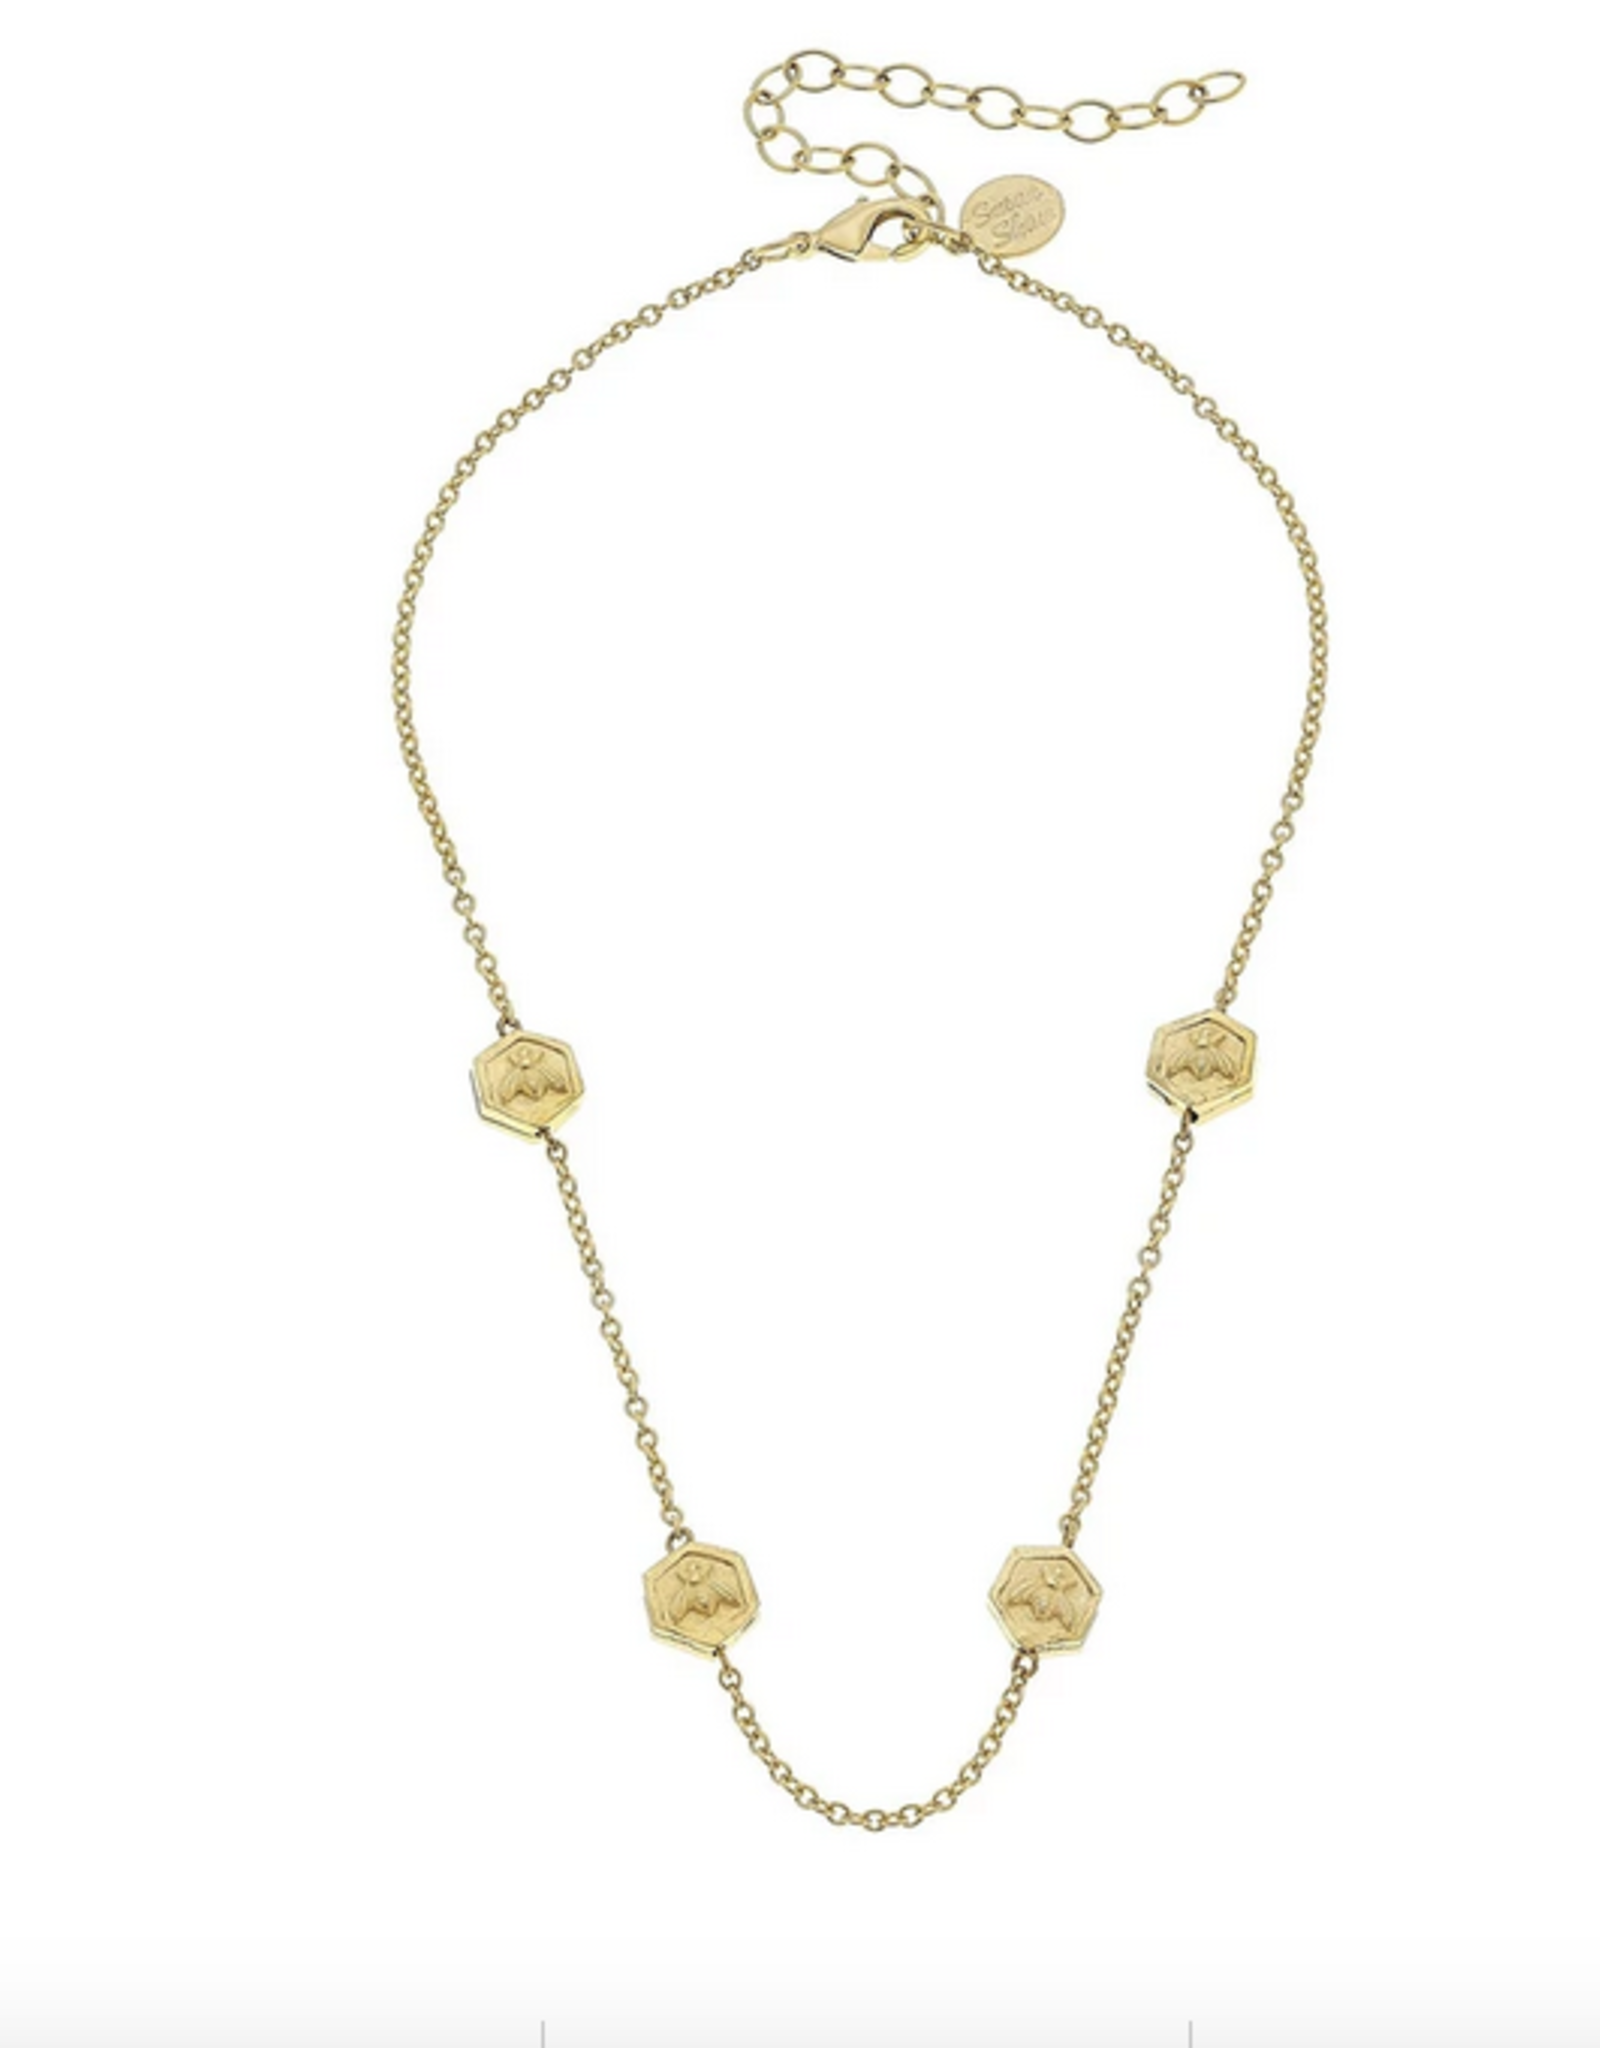 Susan Shaw Gold Bee Beads and Chain Choker